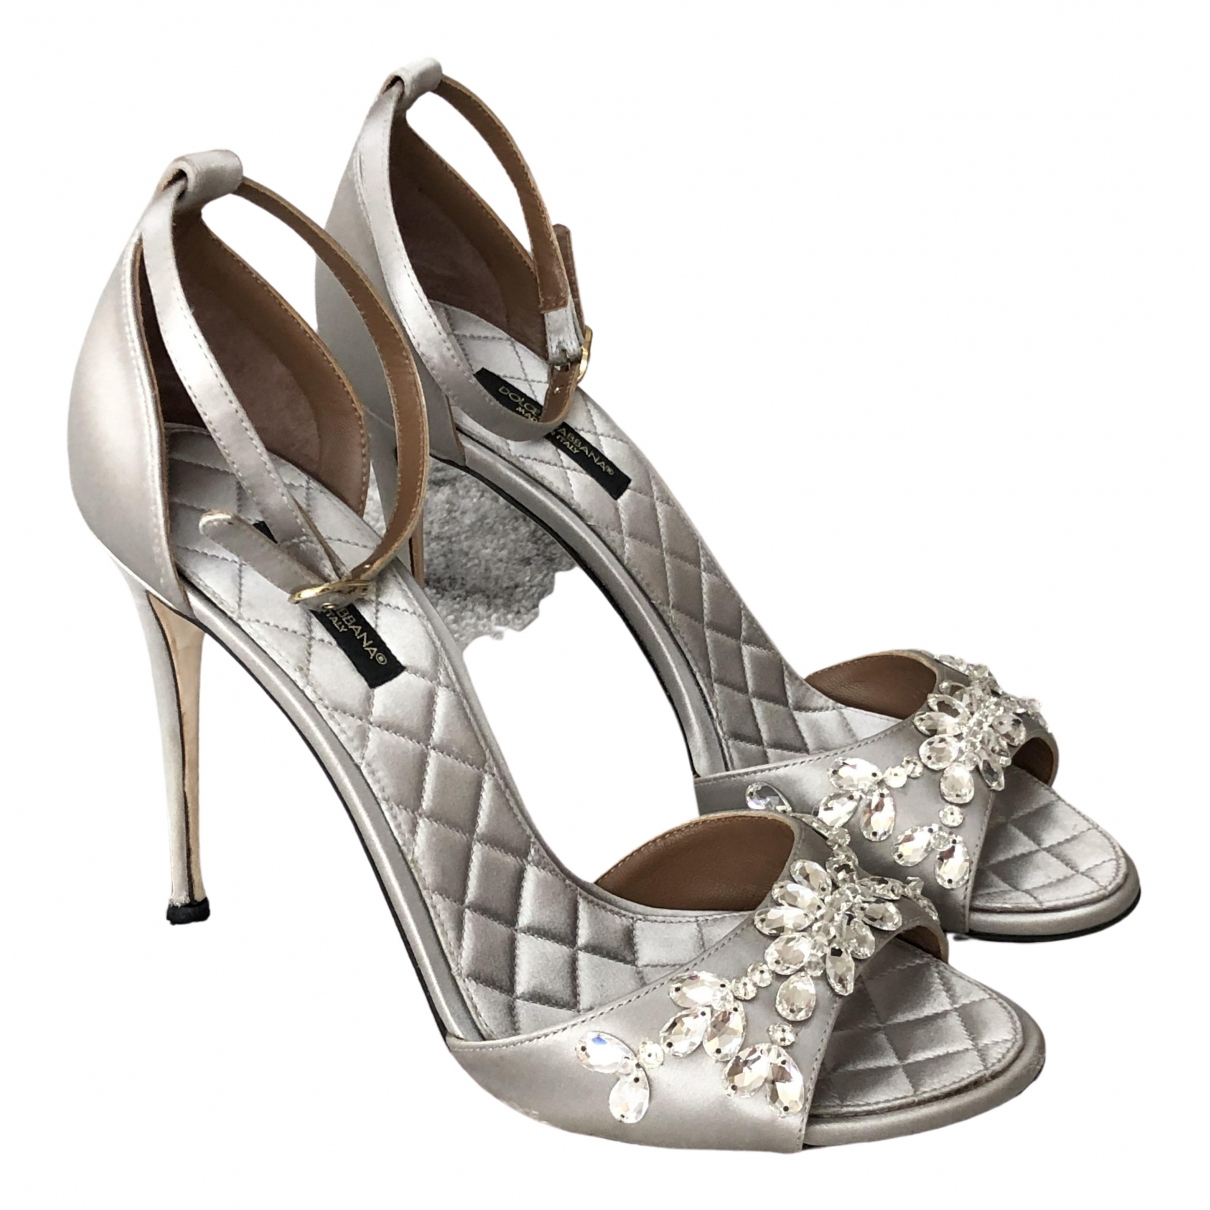 Dolce & Gabbana \N Sandalen in  Silber Leinen